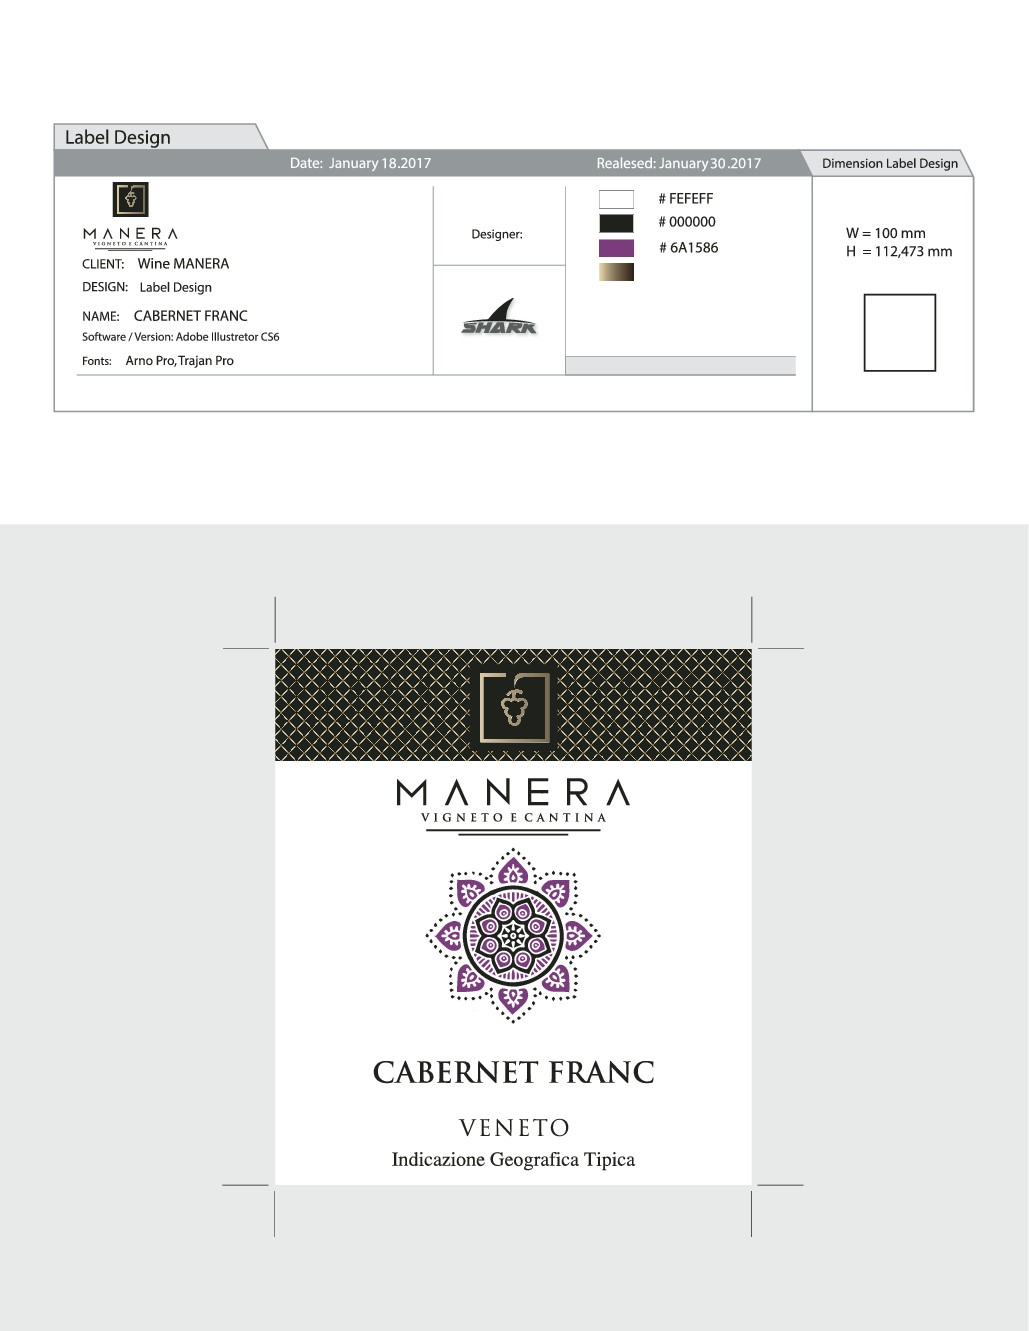 New creative wine label